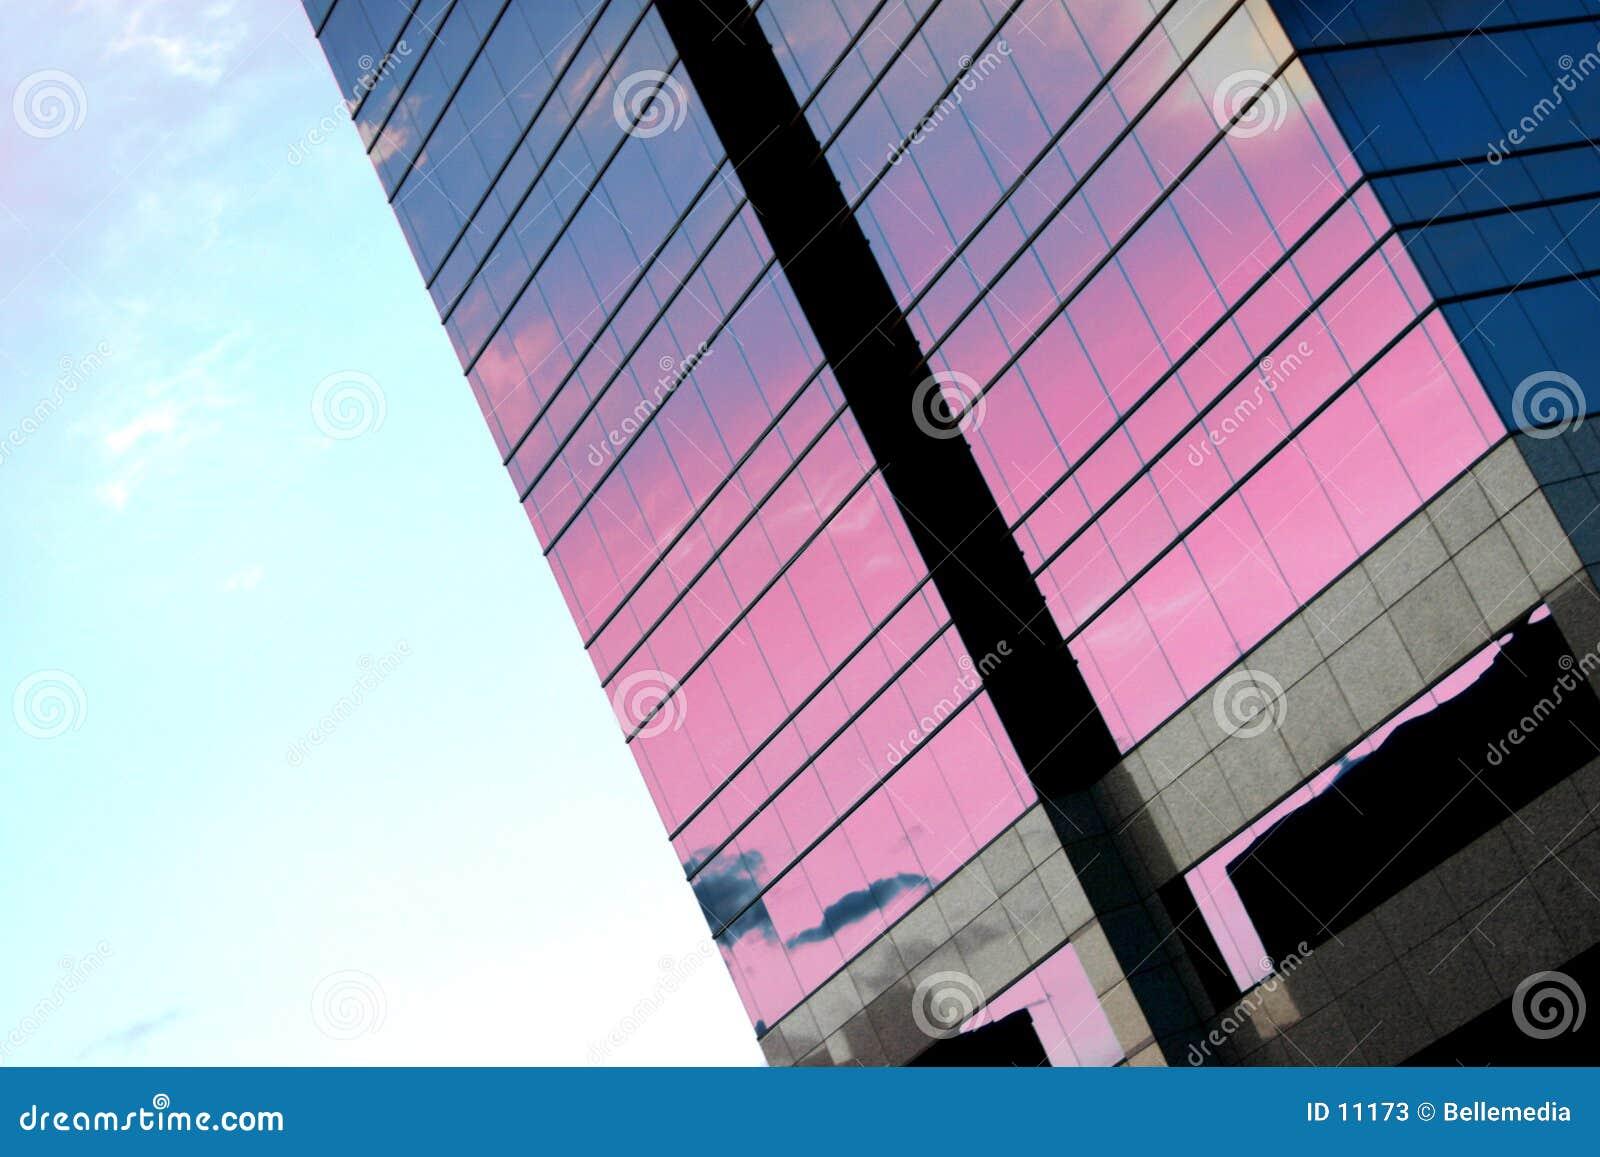 Rarity architecture